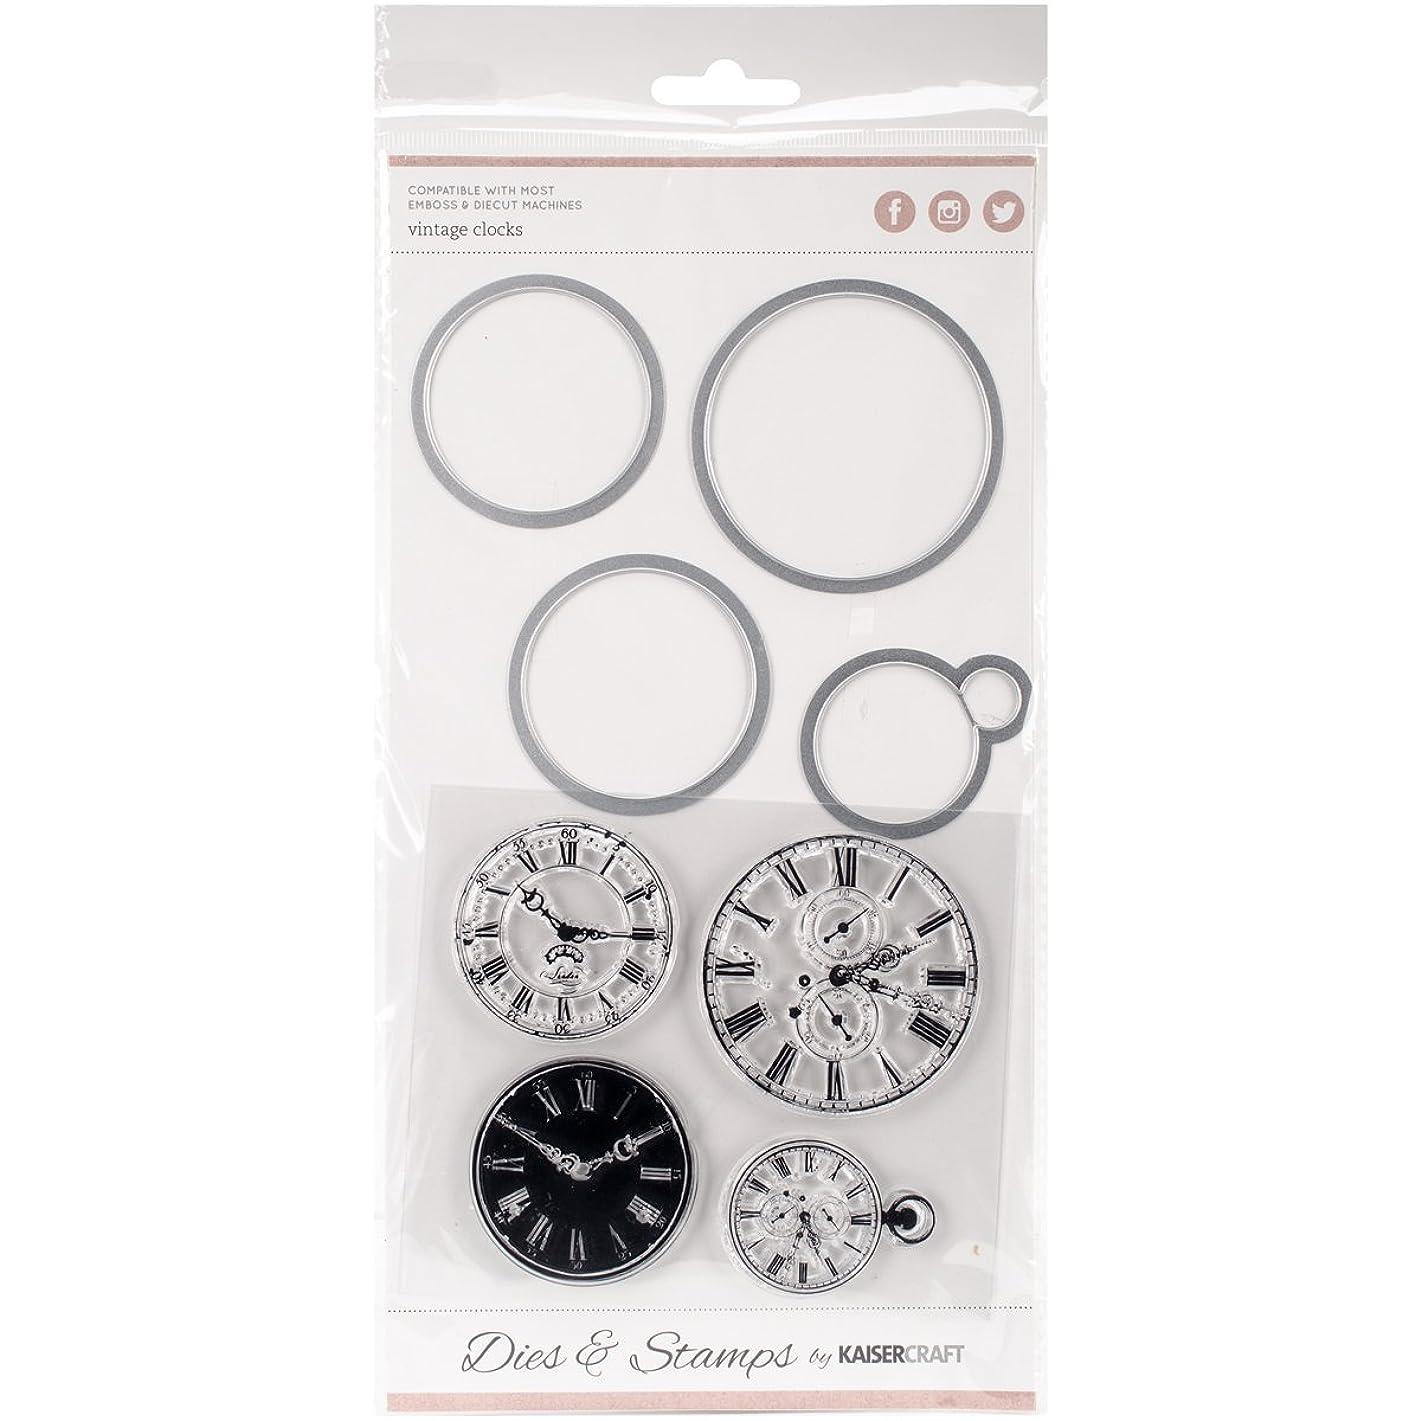 Kaisercraft Dies and Stamps Vintage Clocks 1.75 1.25 inch x 2.25, Acrylic Multicolour, 0.38x14.6x26.67 cm